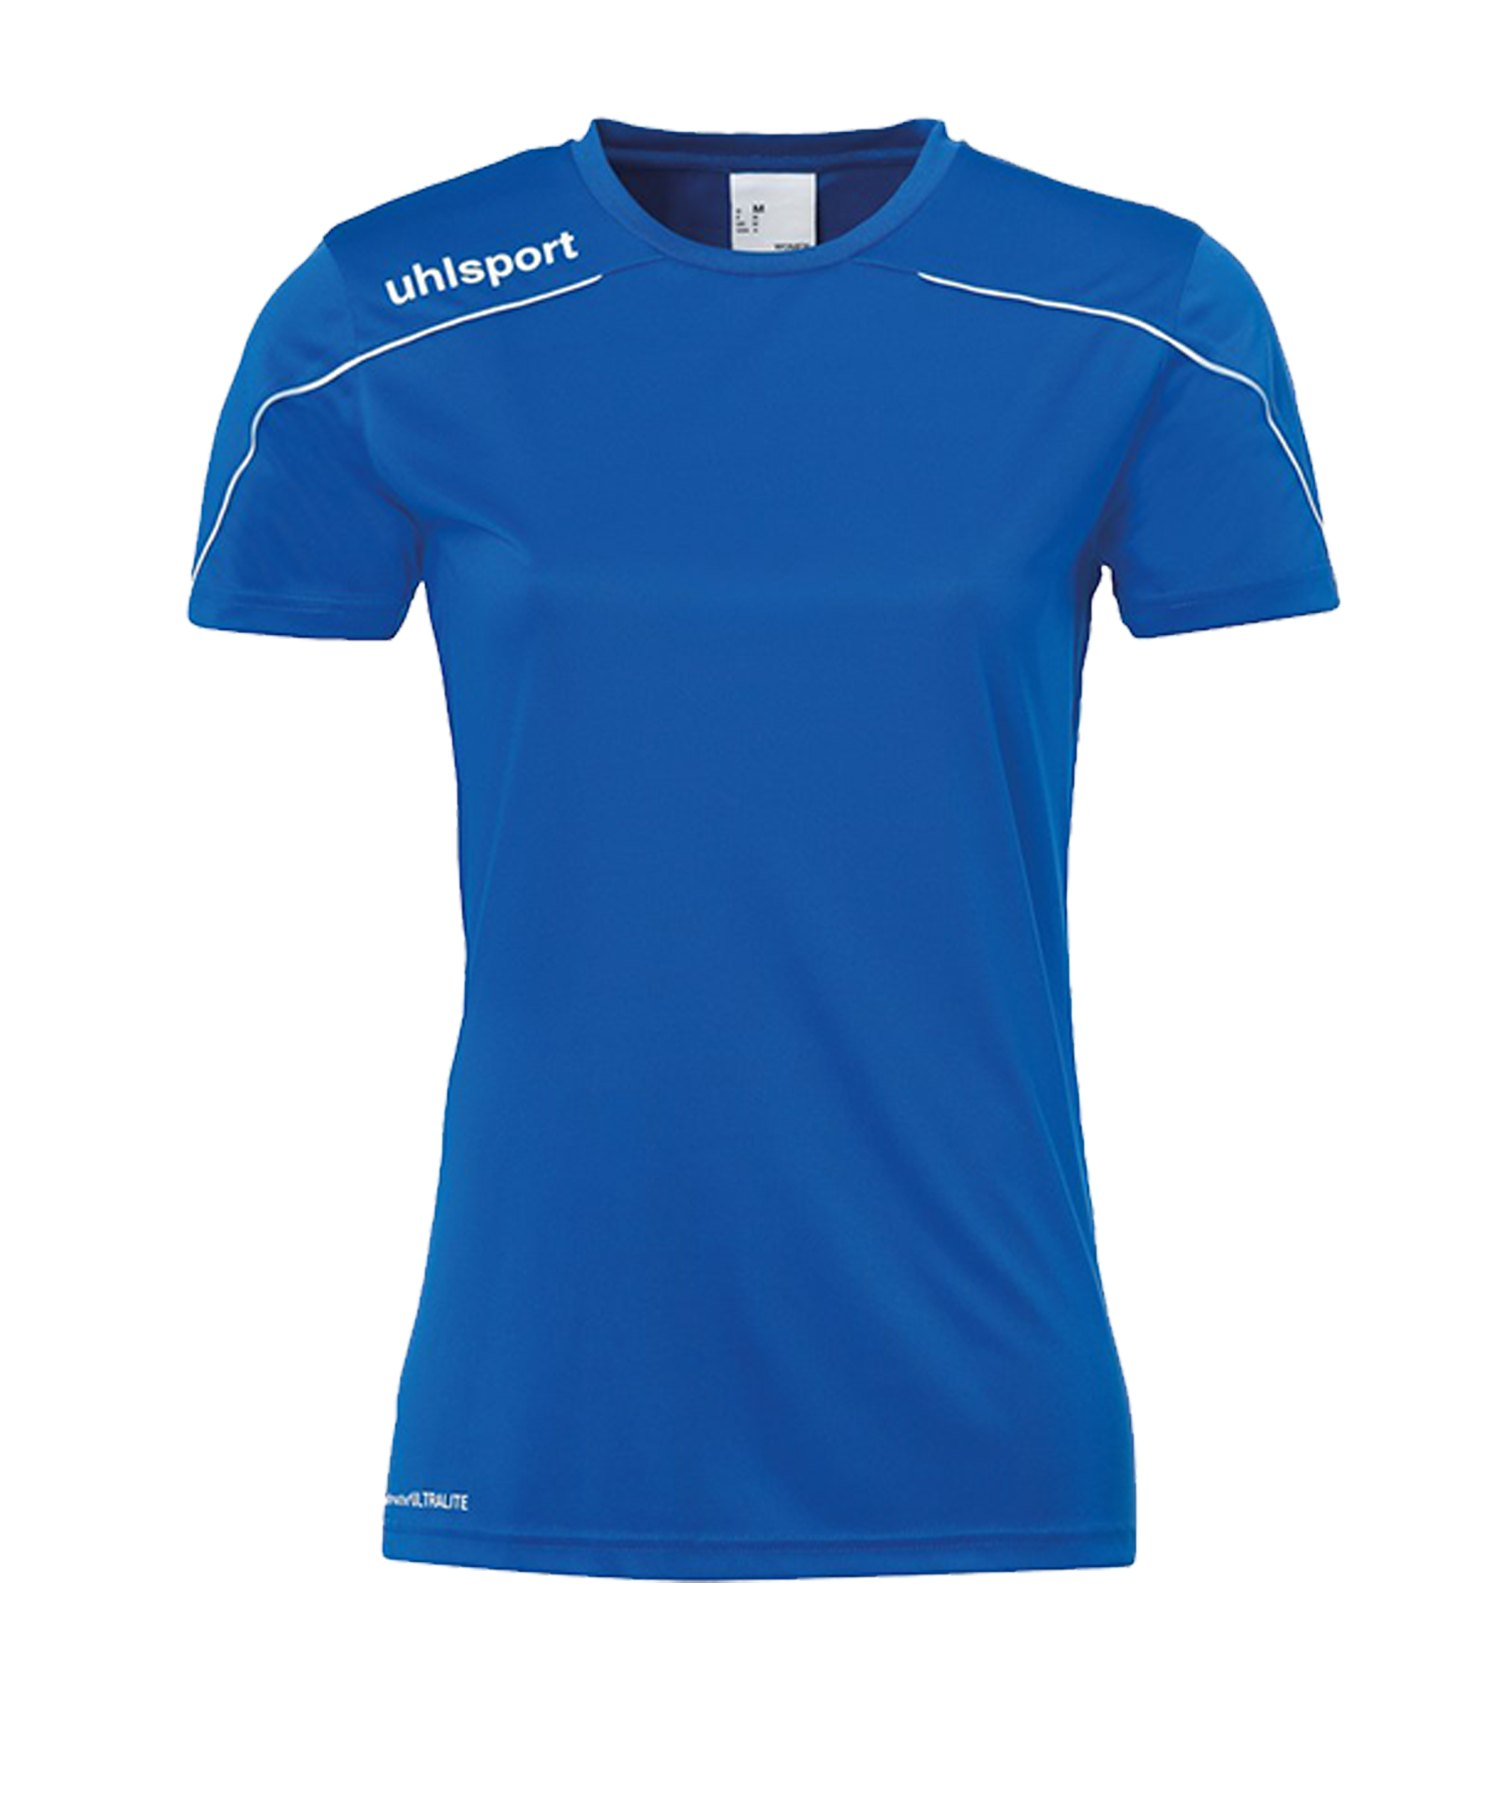 Uhlsport Stream 22 Trikot kurzarm Damen Blau F03 - Blau